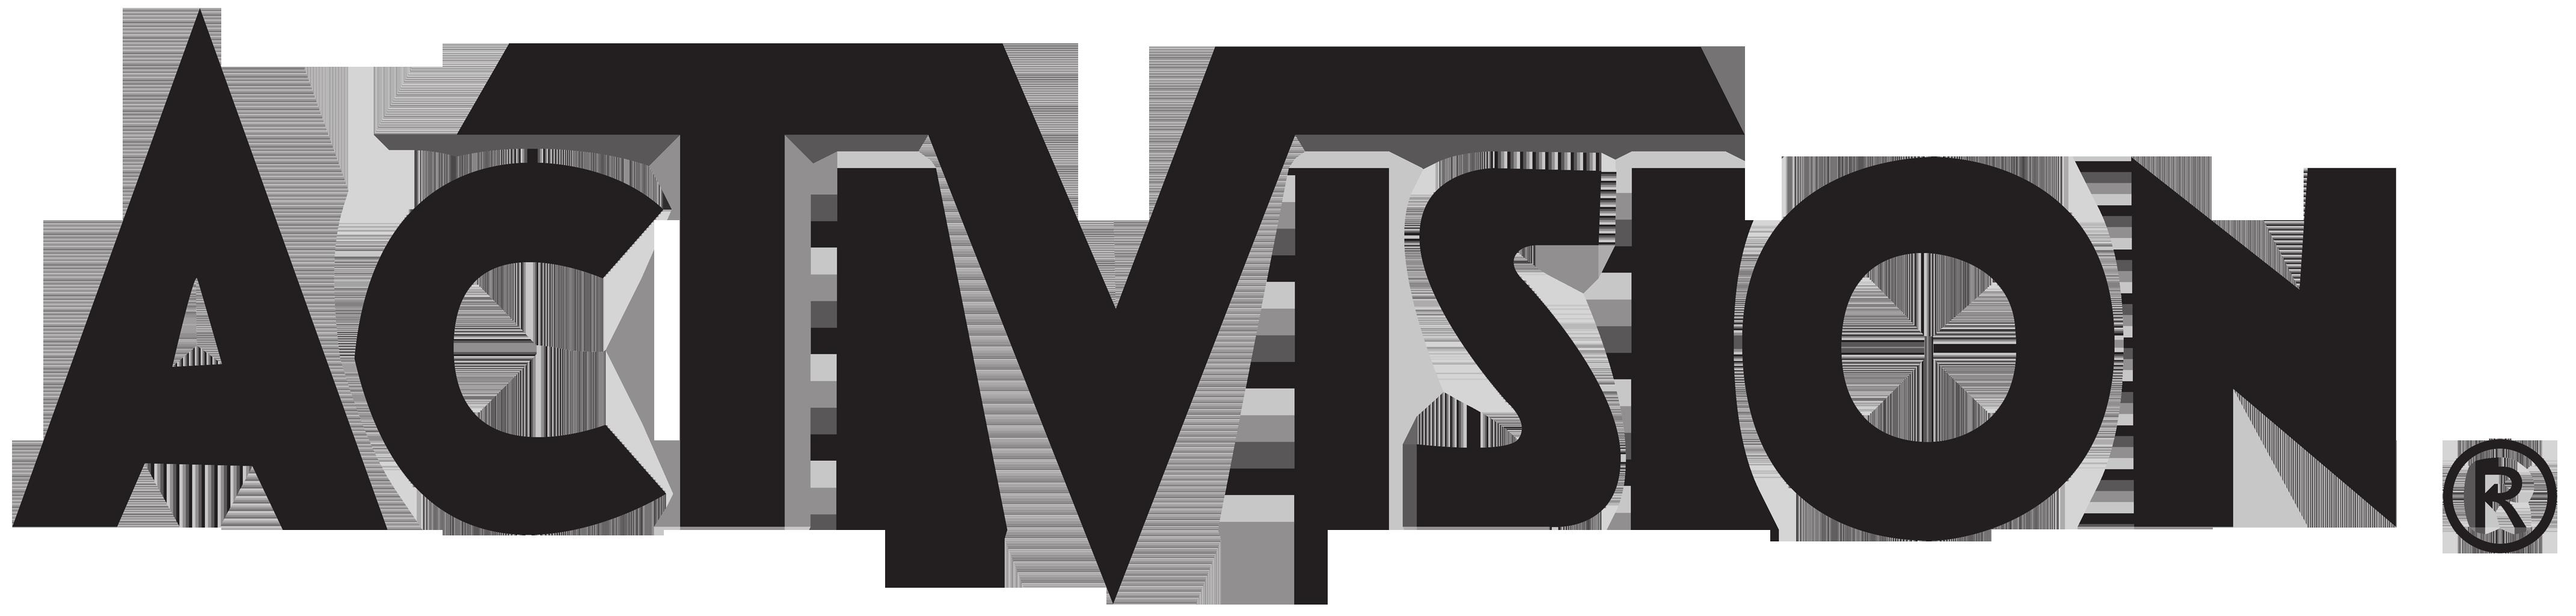 Activision_logo